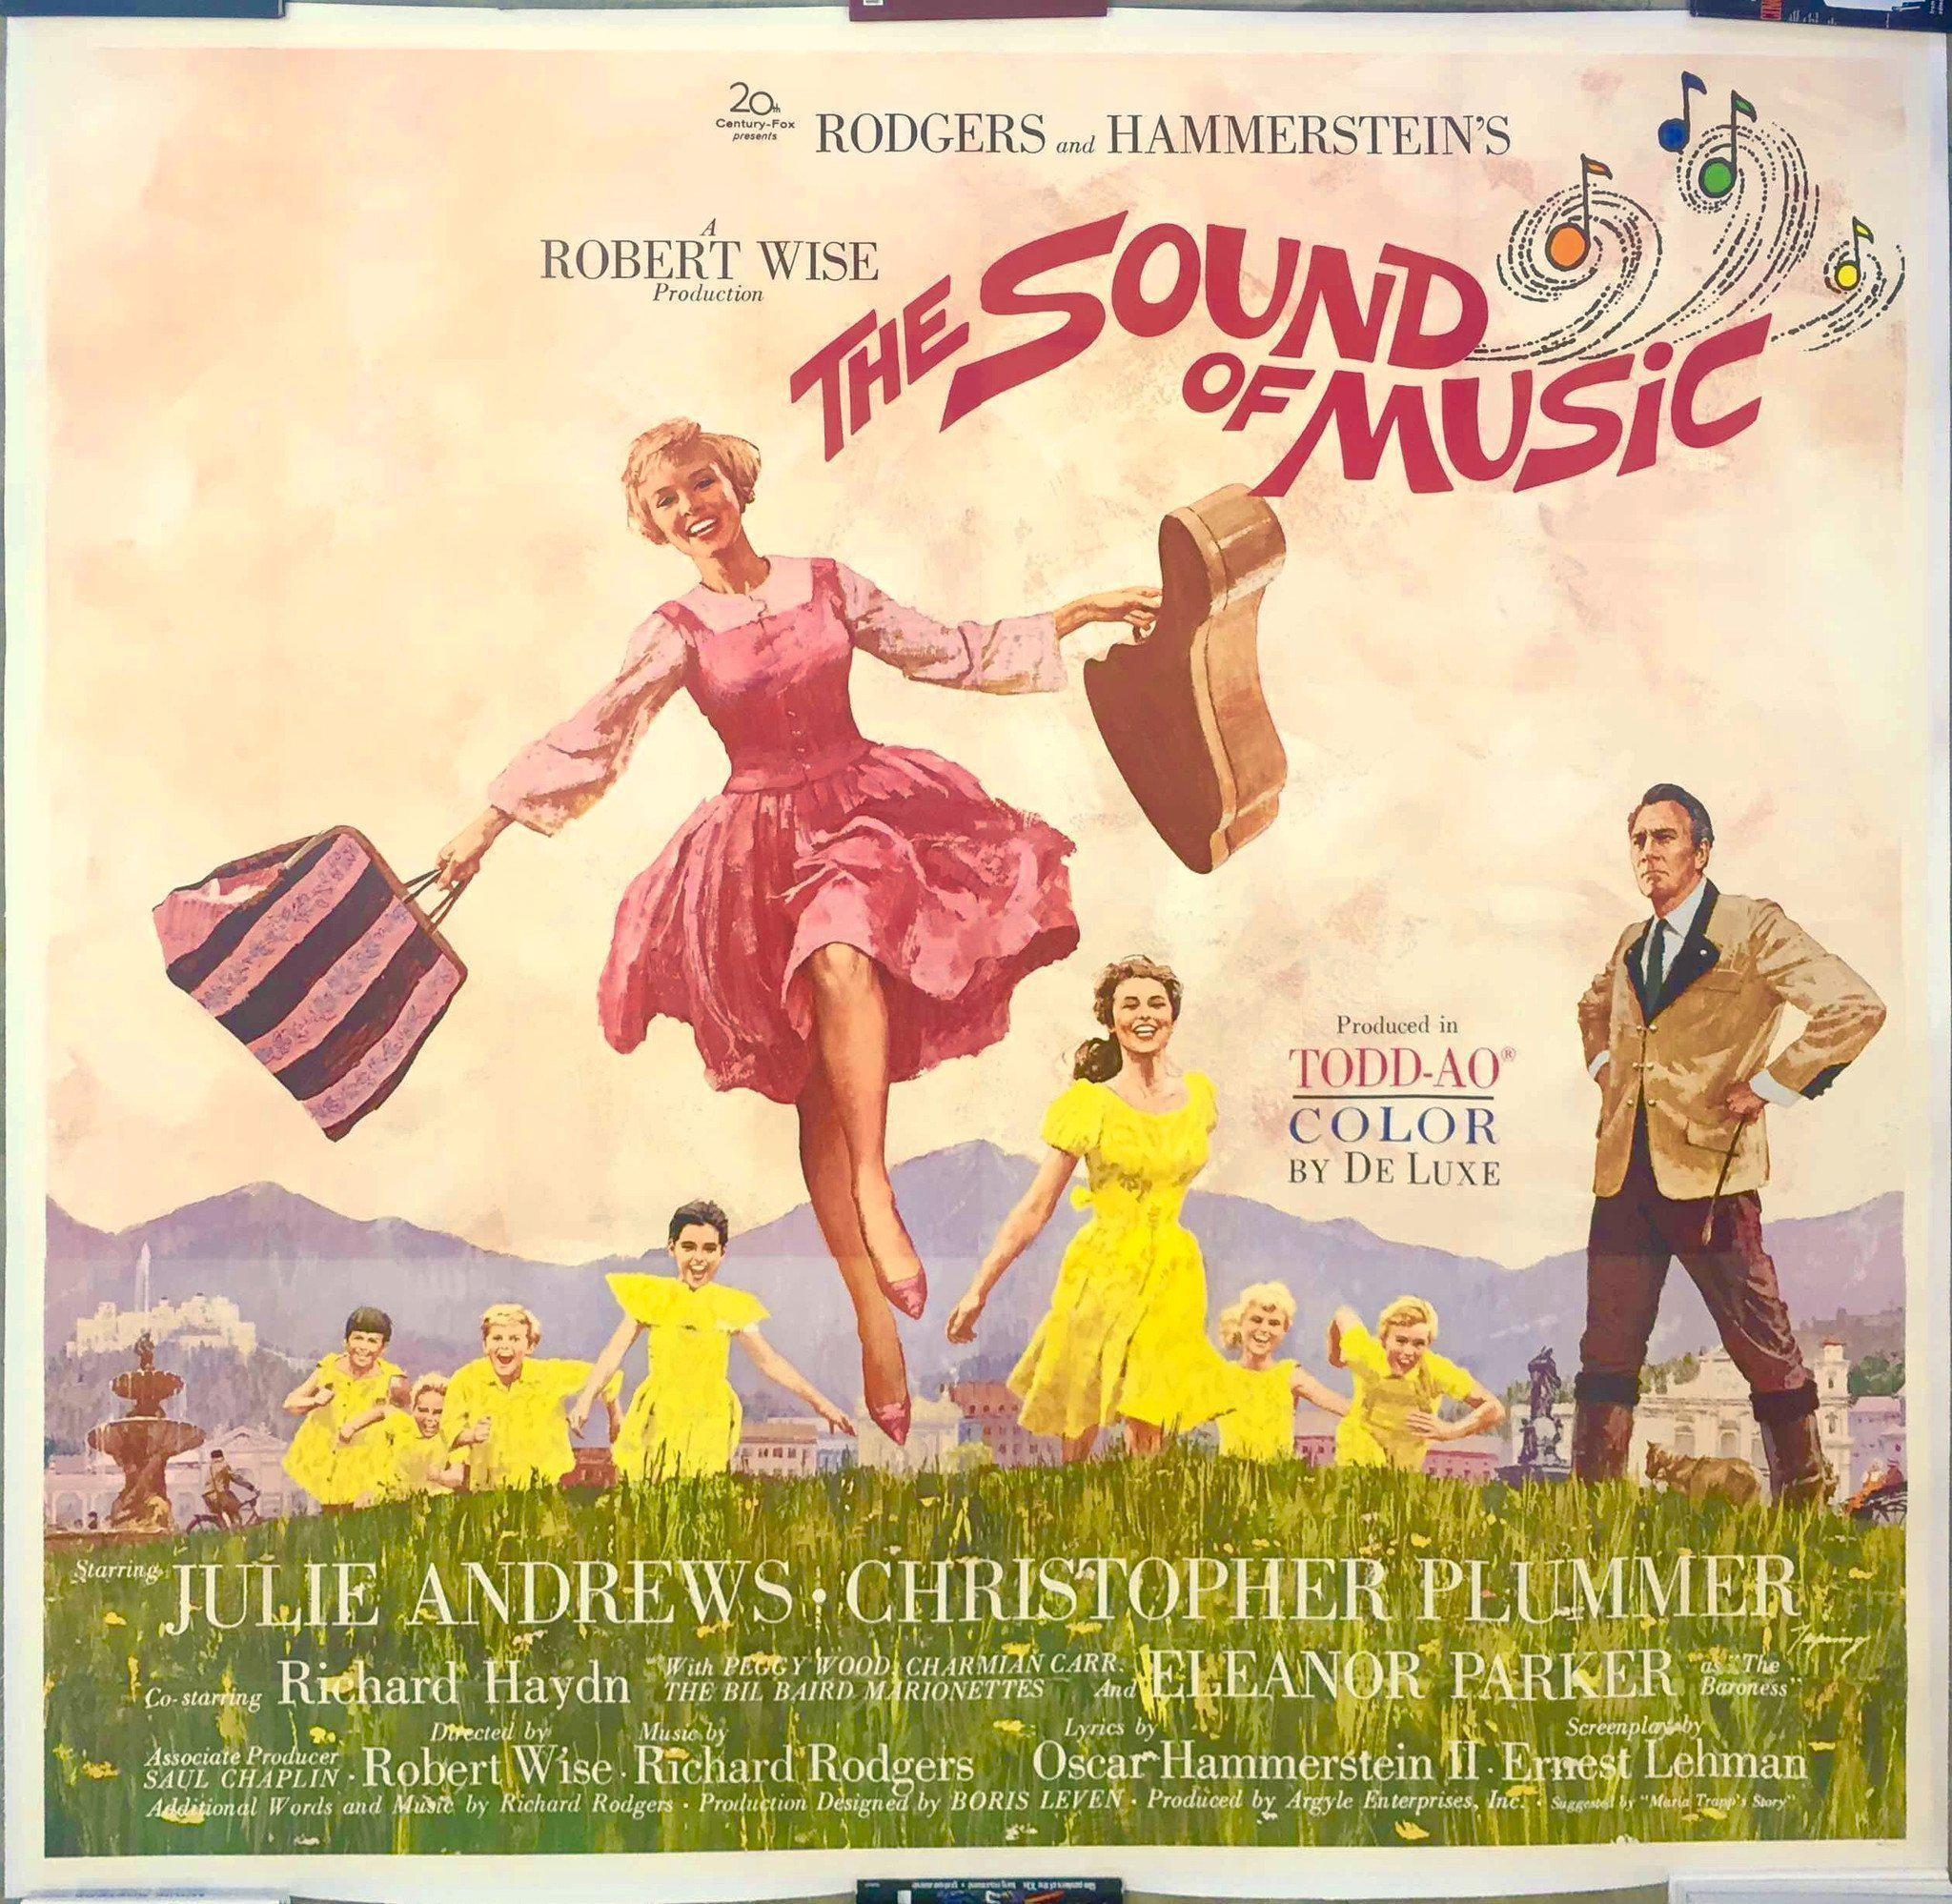 the-sound-of-music-vintage-movie-poster-original-6-sheet-81x81-6062.jpg